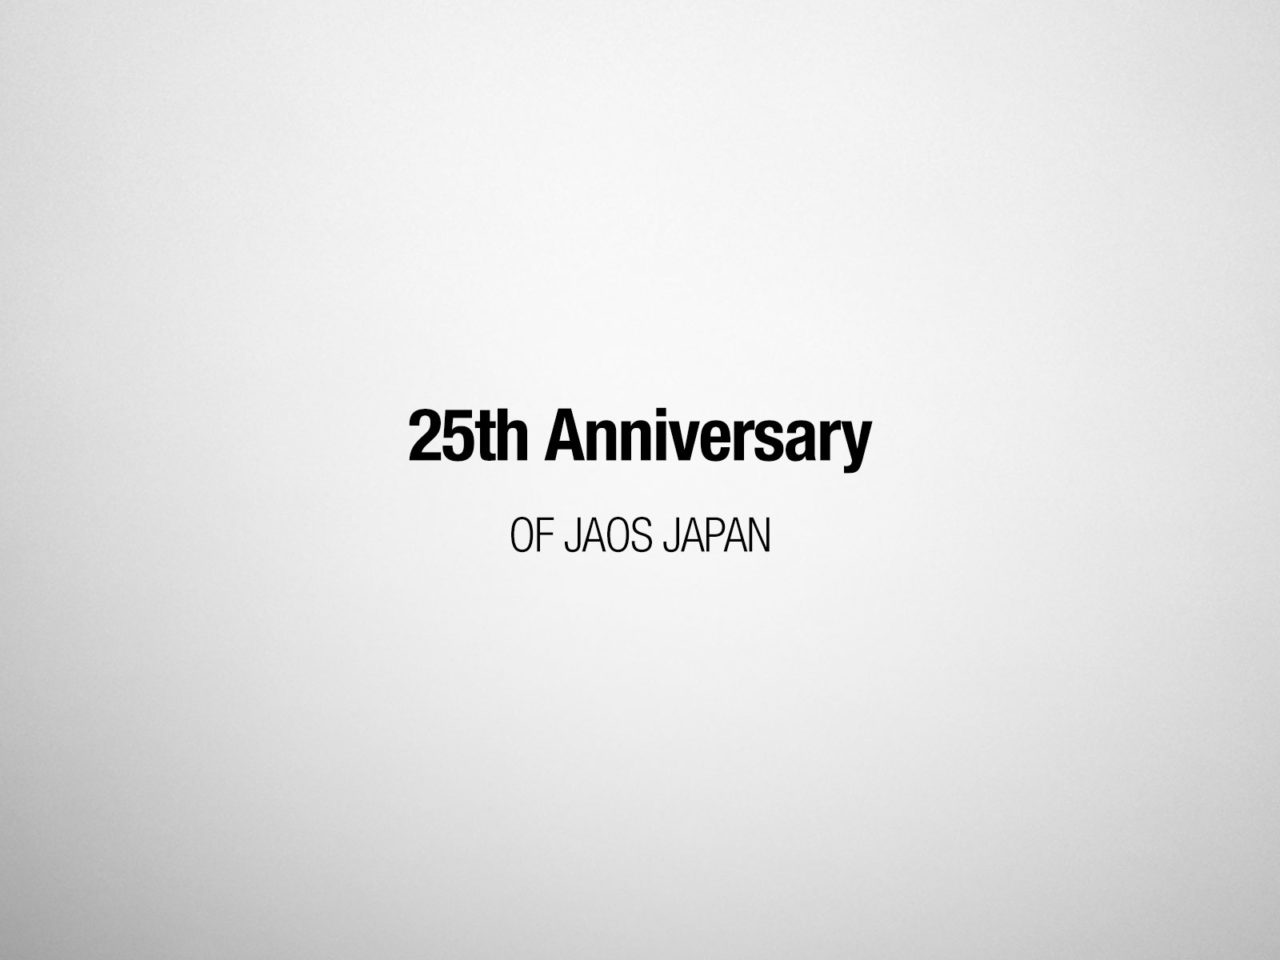 25th Anniversary of JAOS Japan